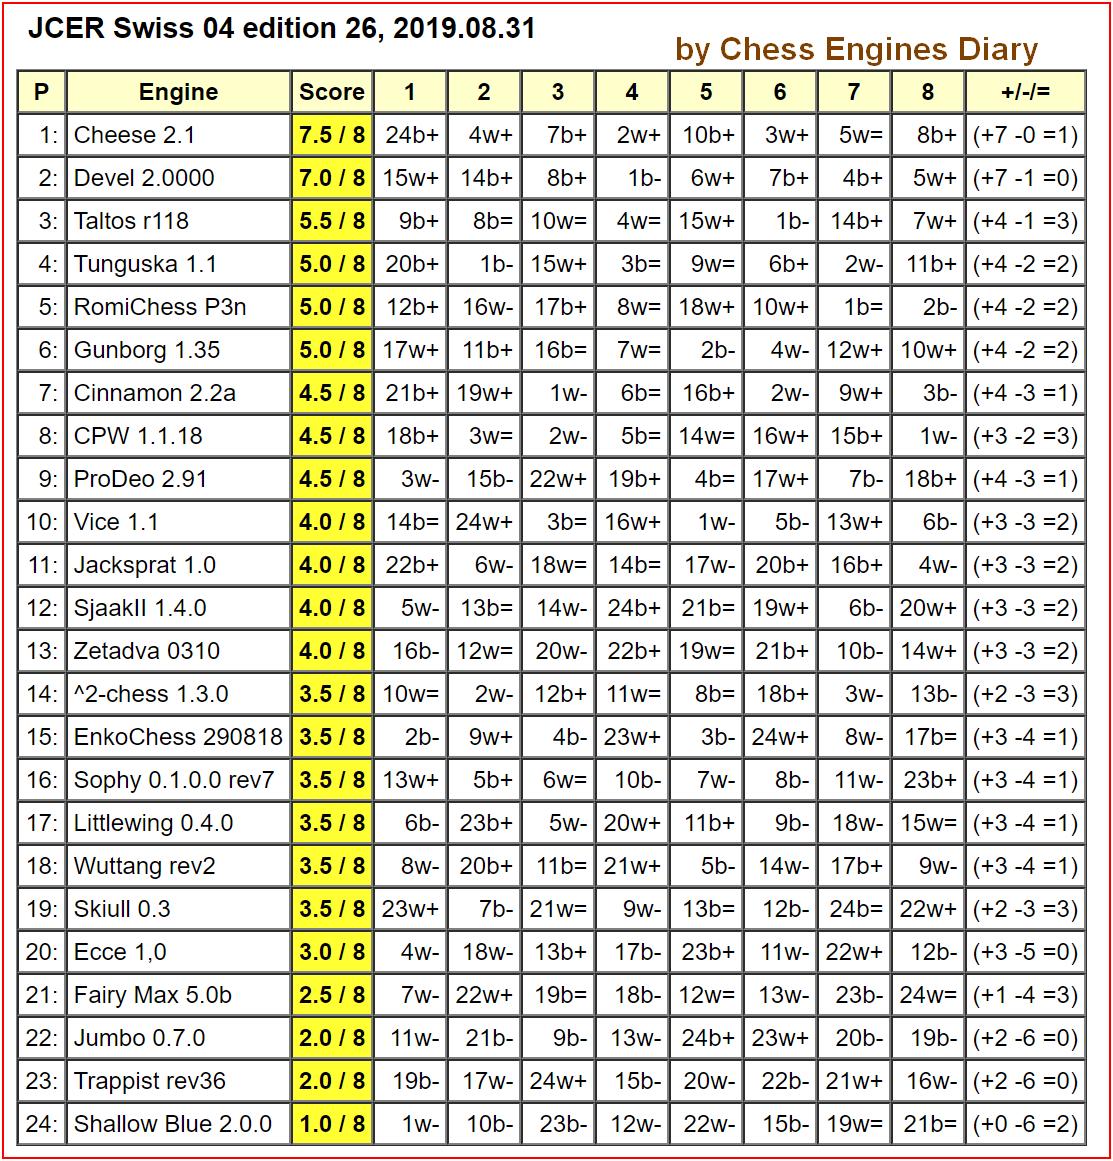 JCER Tournament 2019 - Page 6 2019.08.31.Swiss04.ed26.html